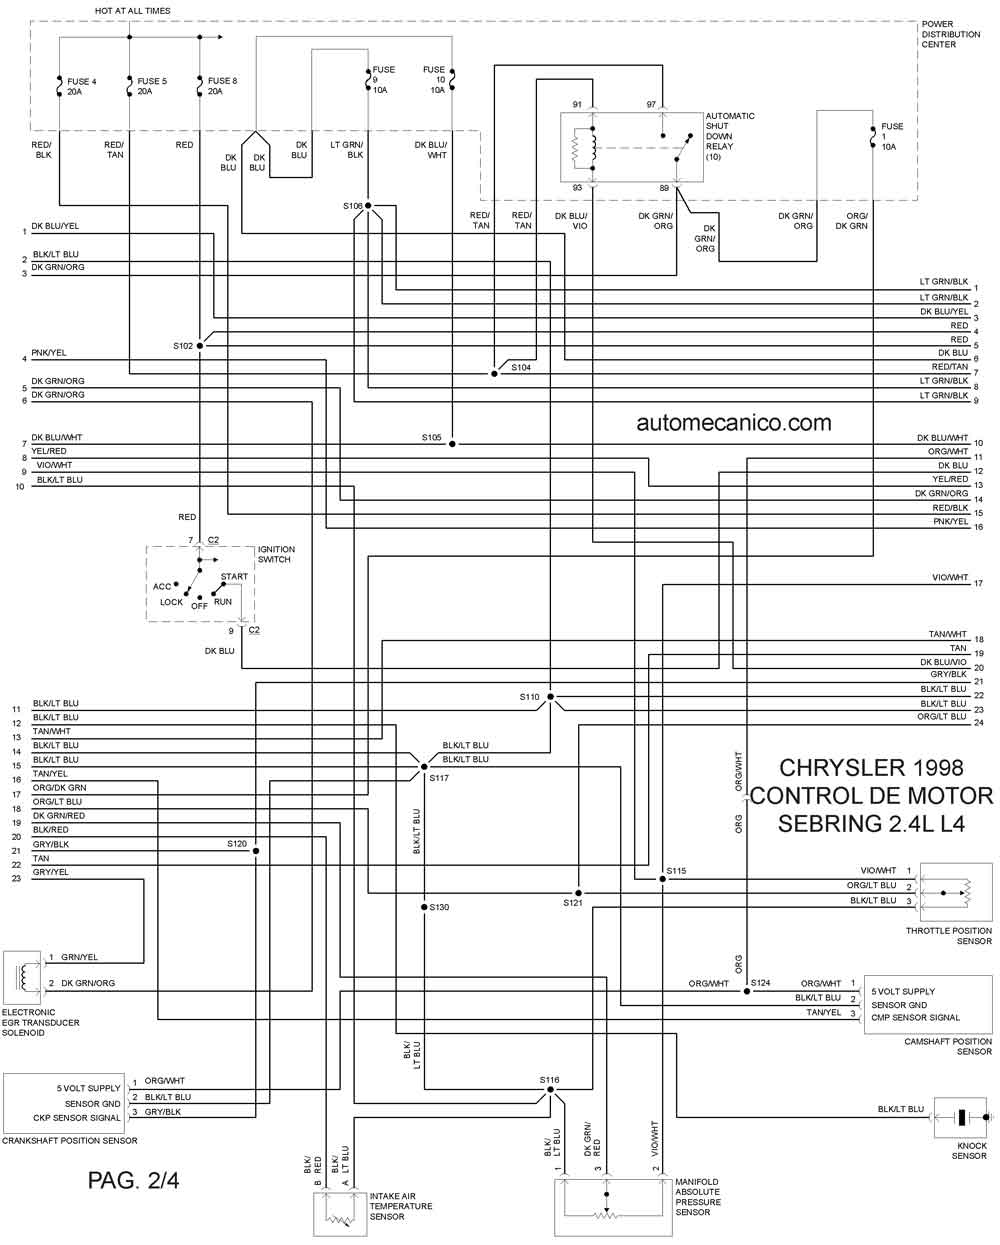 Diagrama Electrico De Un Dodge Stratus 1998. Dodge. Auto